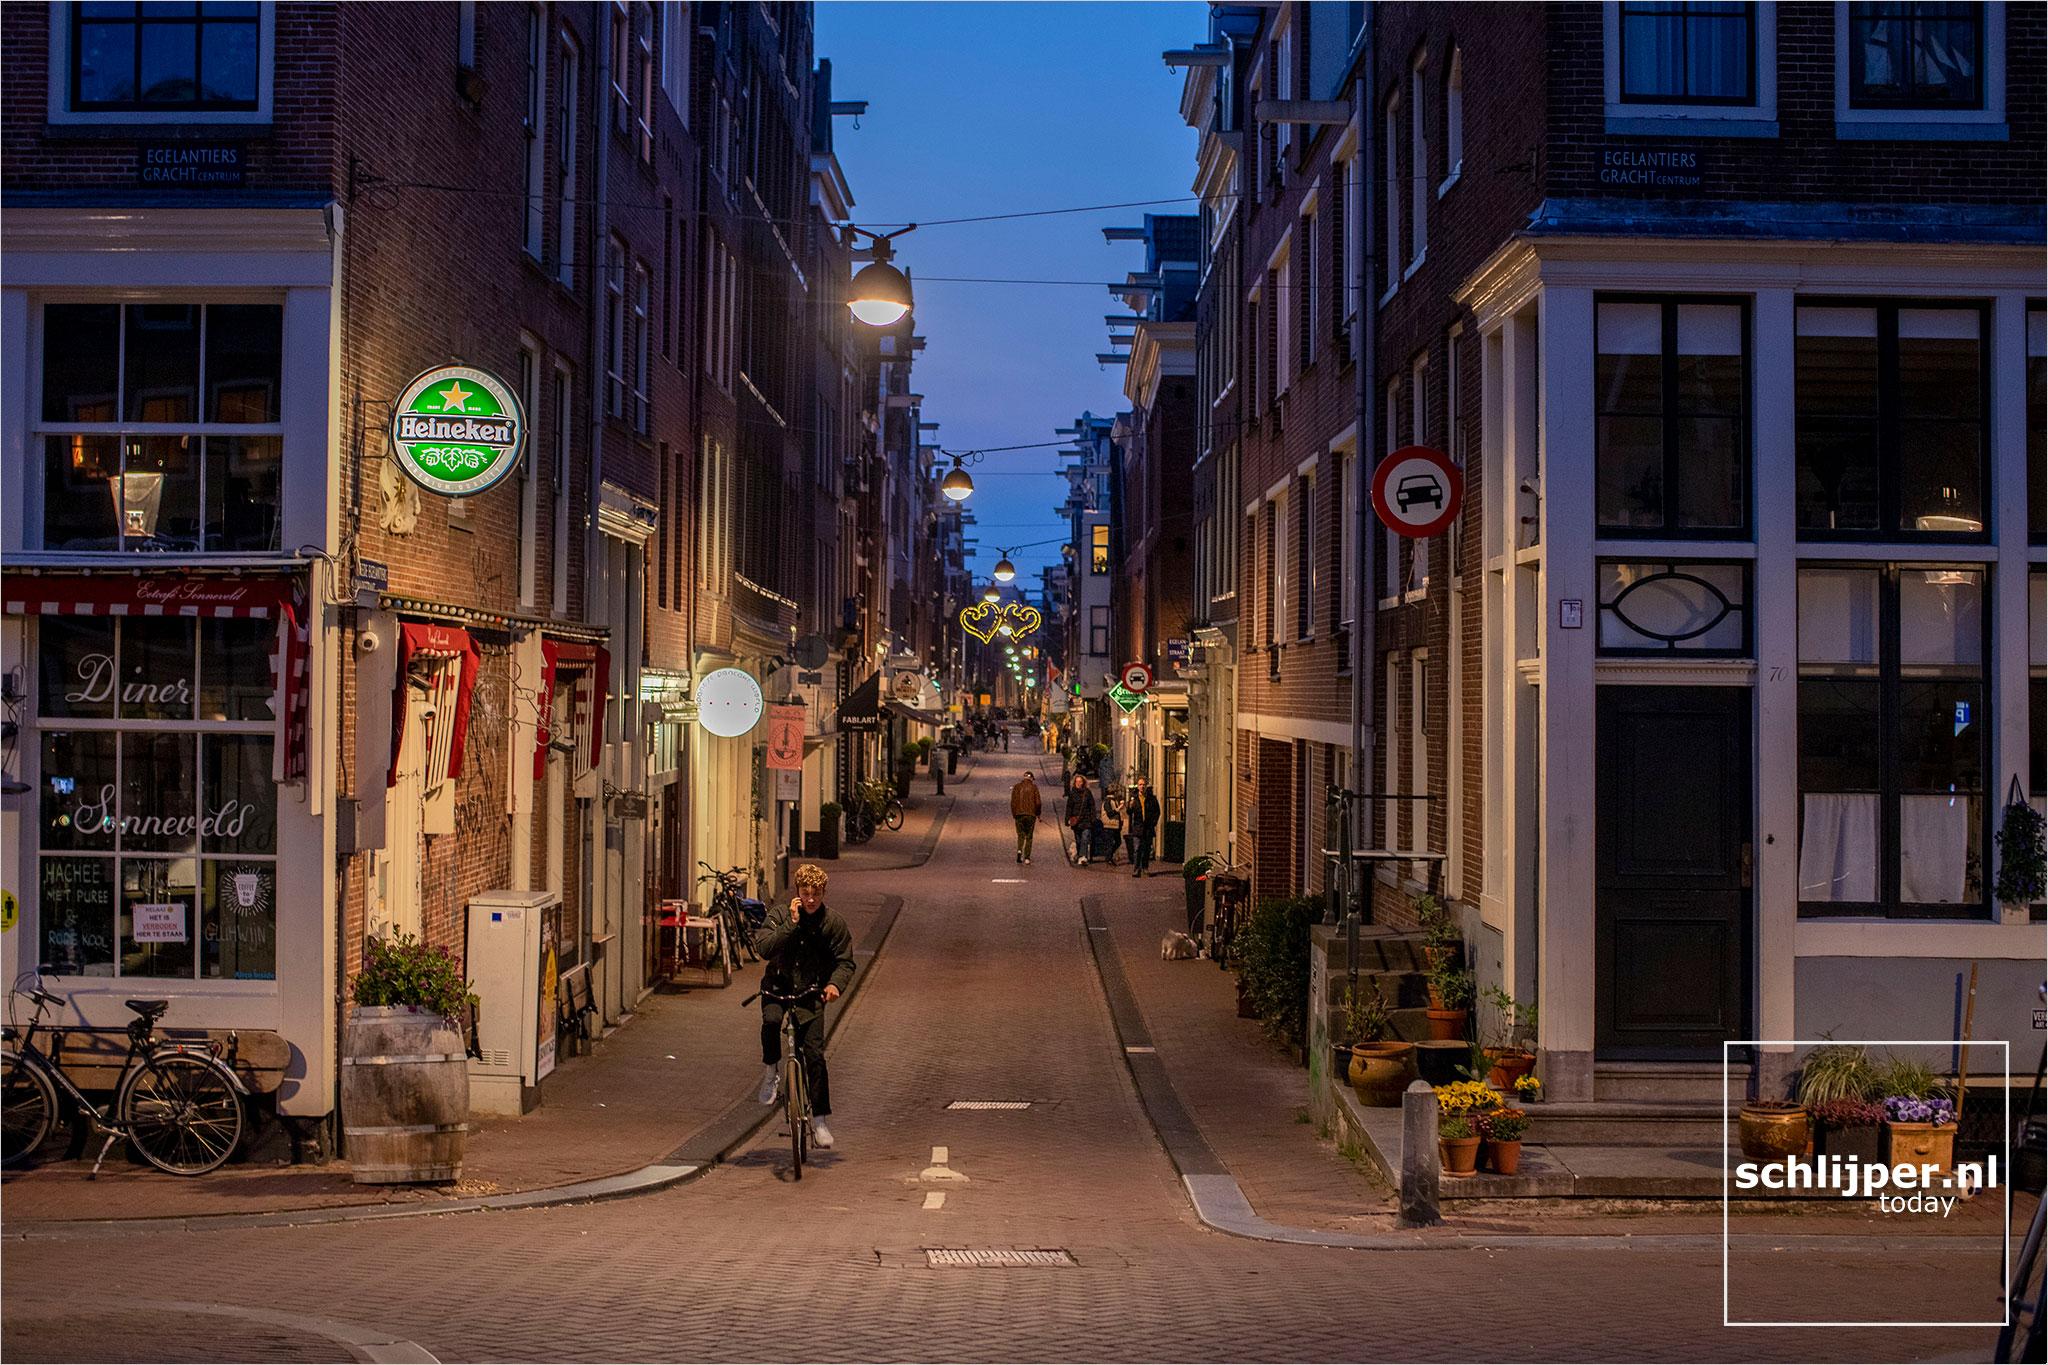 The Netherlands, Amsterdam, 17 april 2021